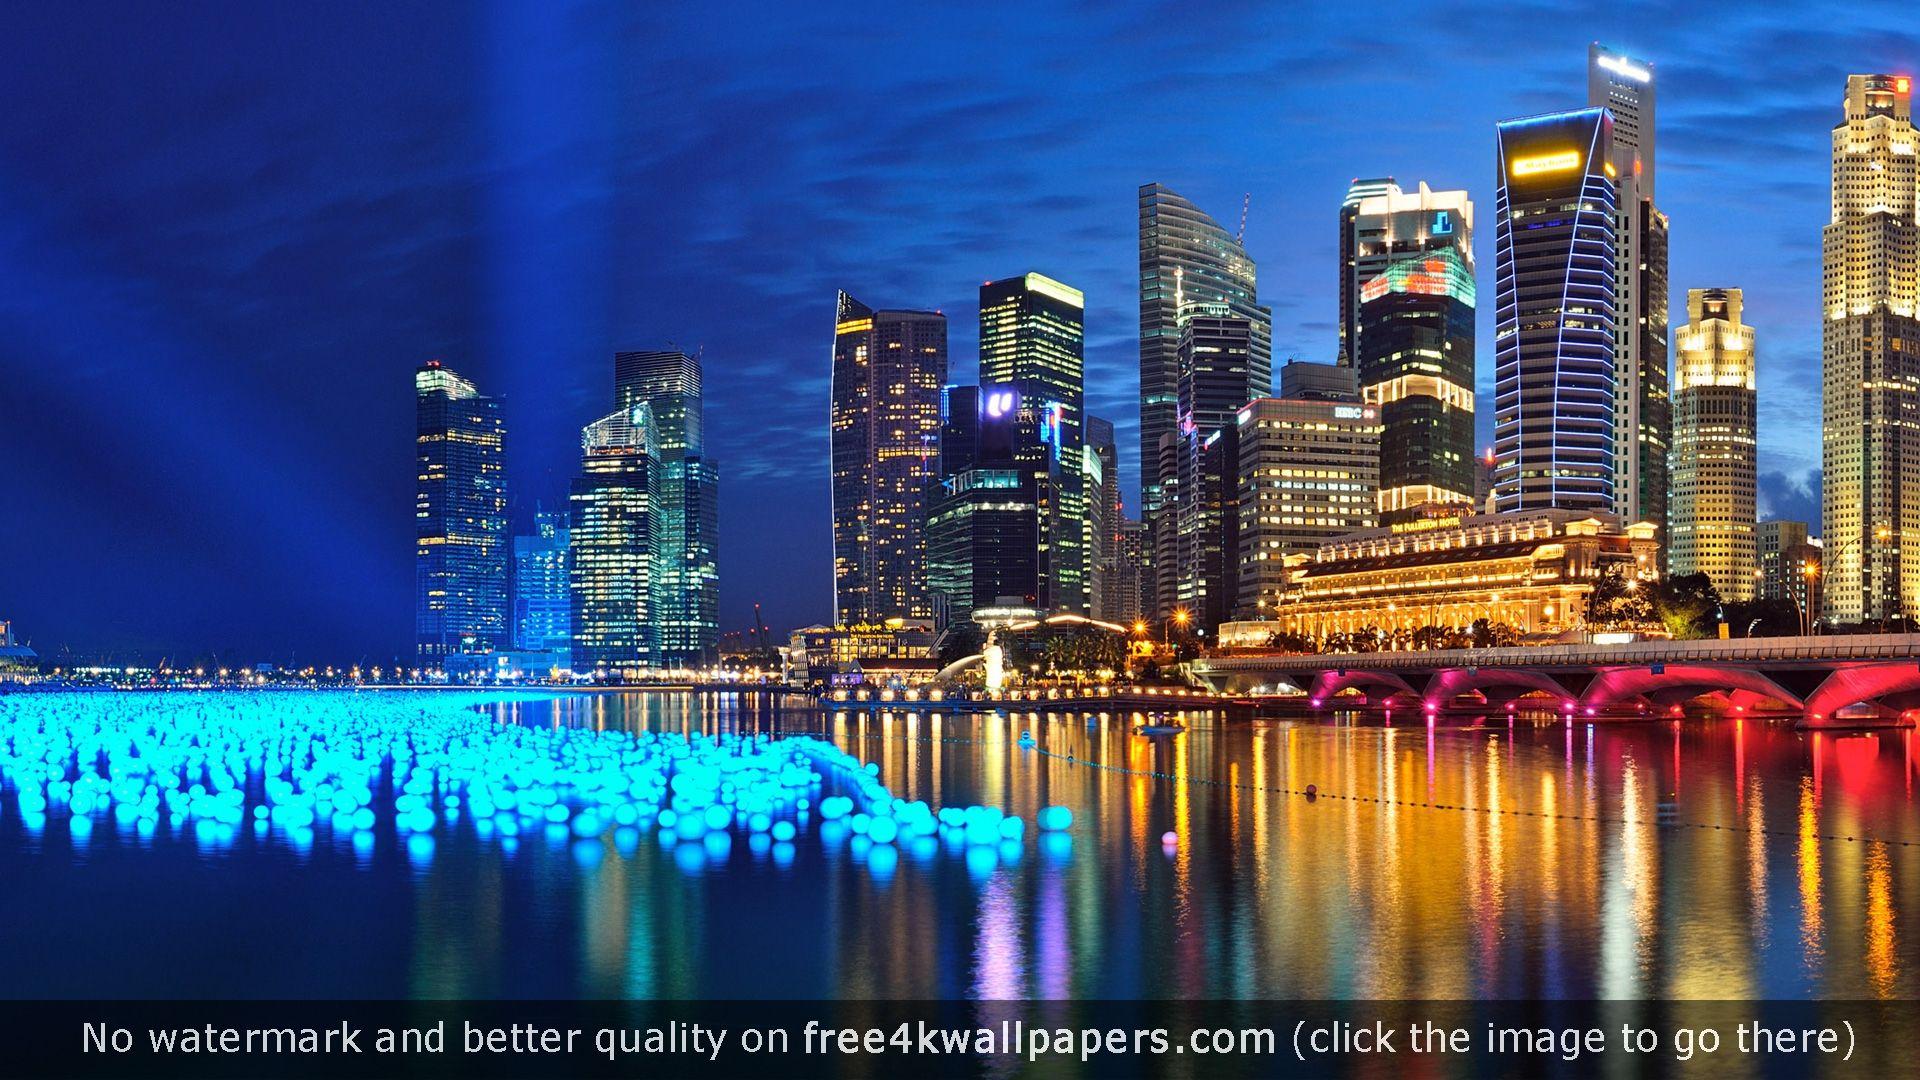 Marina Bay Singapore Panorama Hd Wallpaper Types Of Photography Wallpaper Gallery City Wallpaper